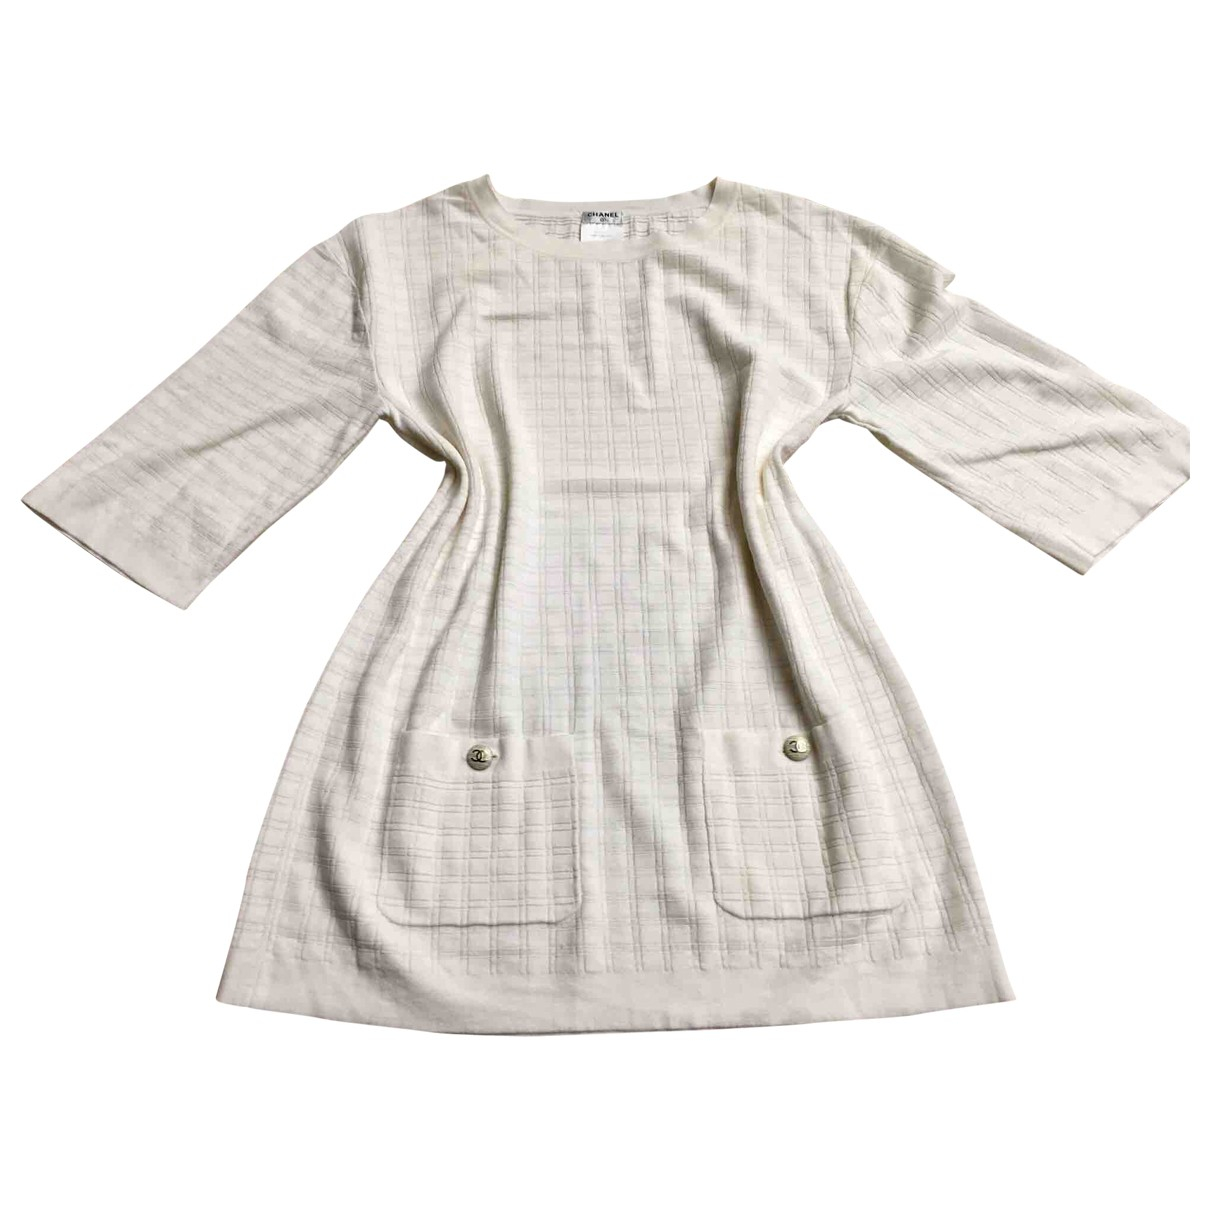 Chanel \N White Cotton dress for Women 42 FR